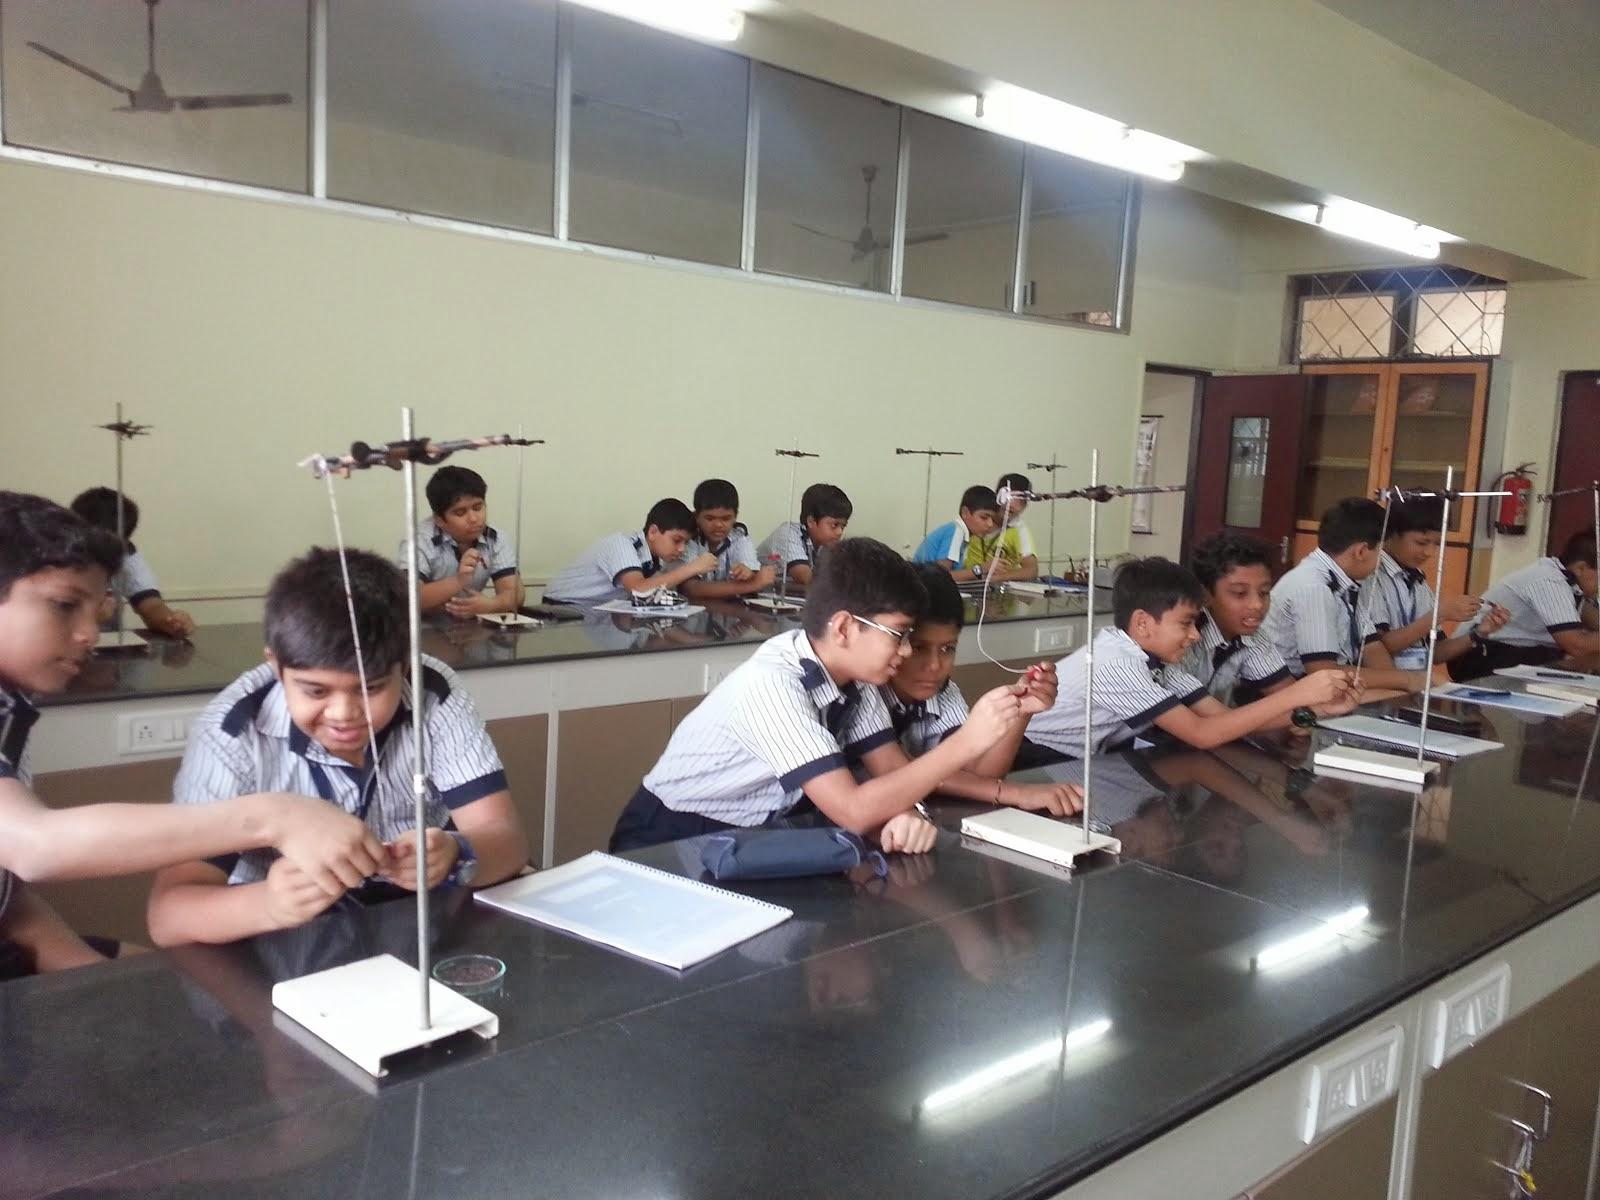 The Rustomjee Cambridge Diaries Grade 6 Physics